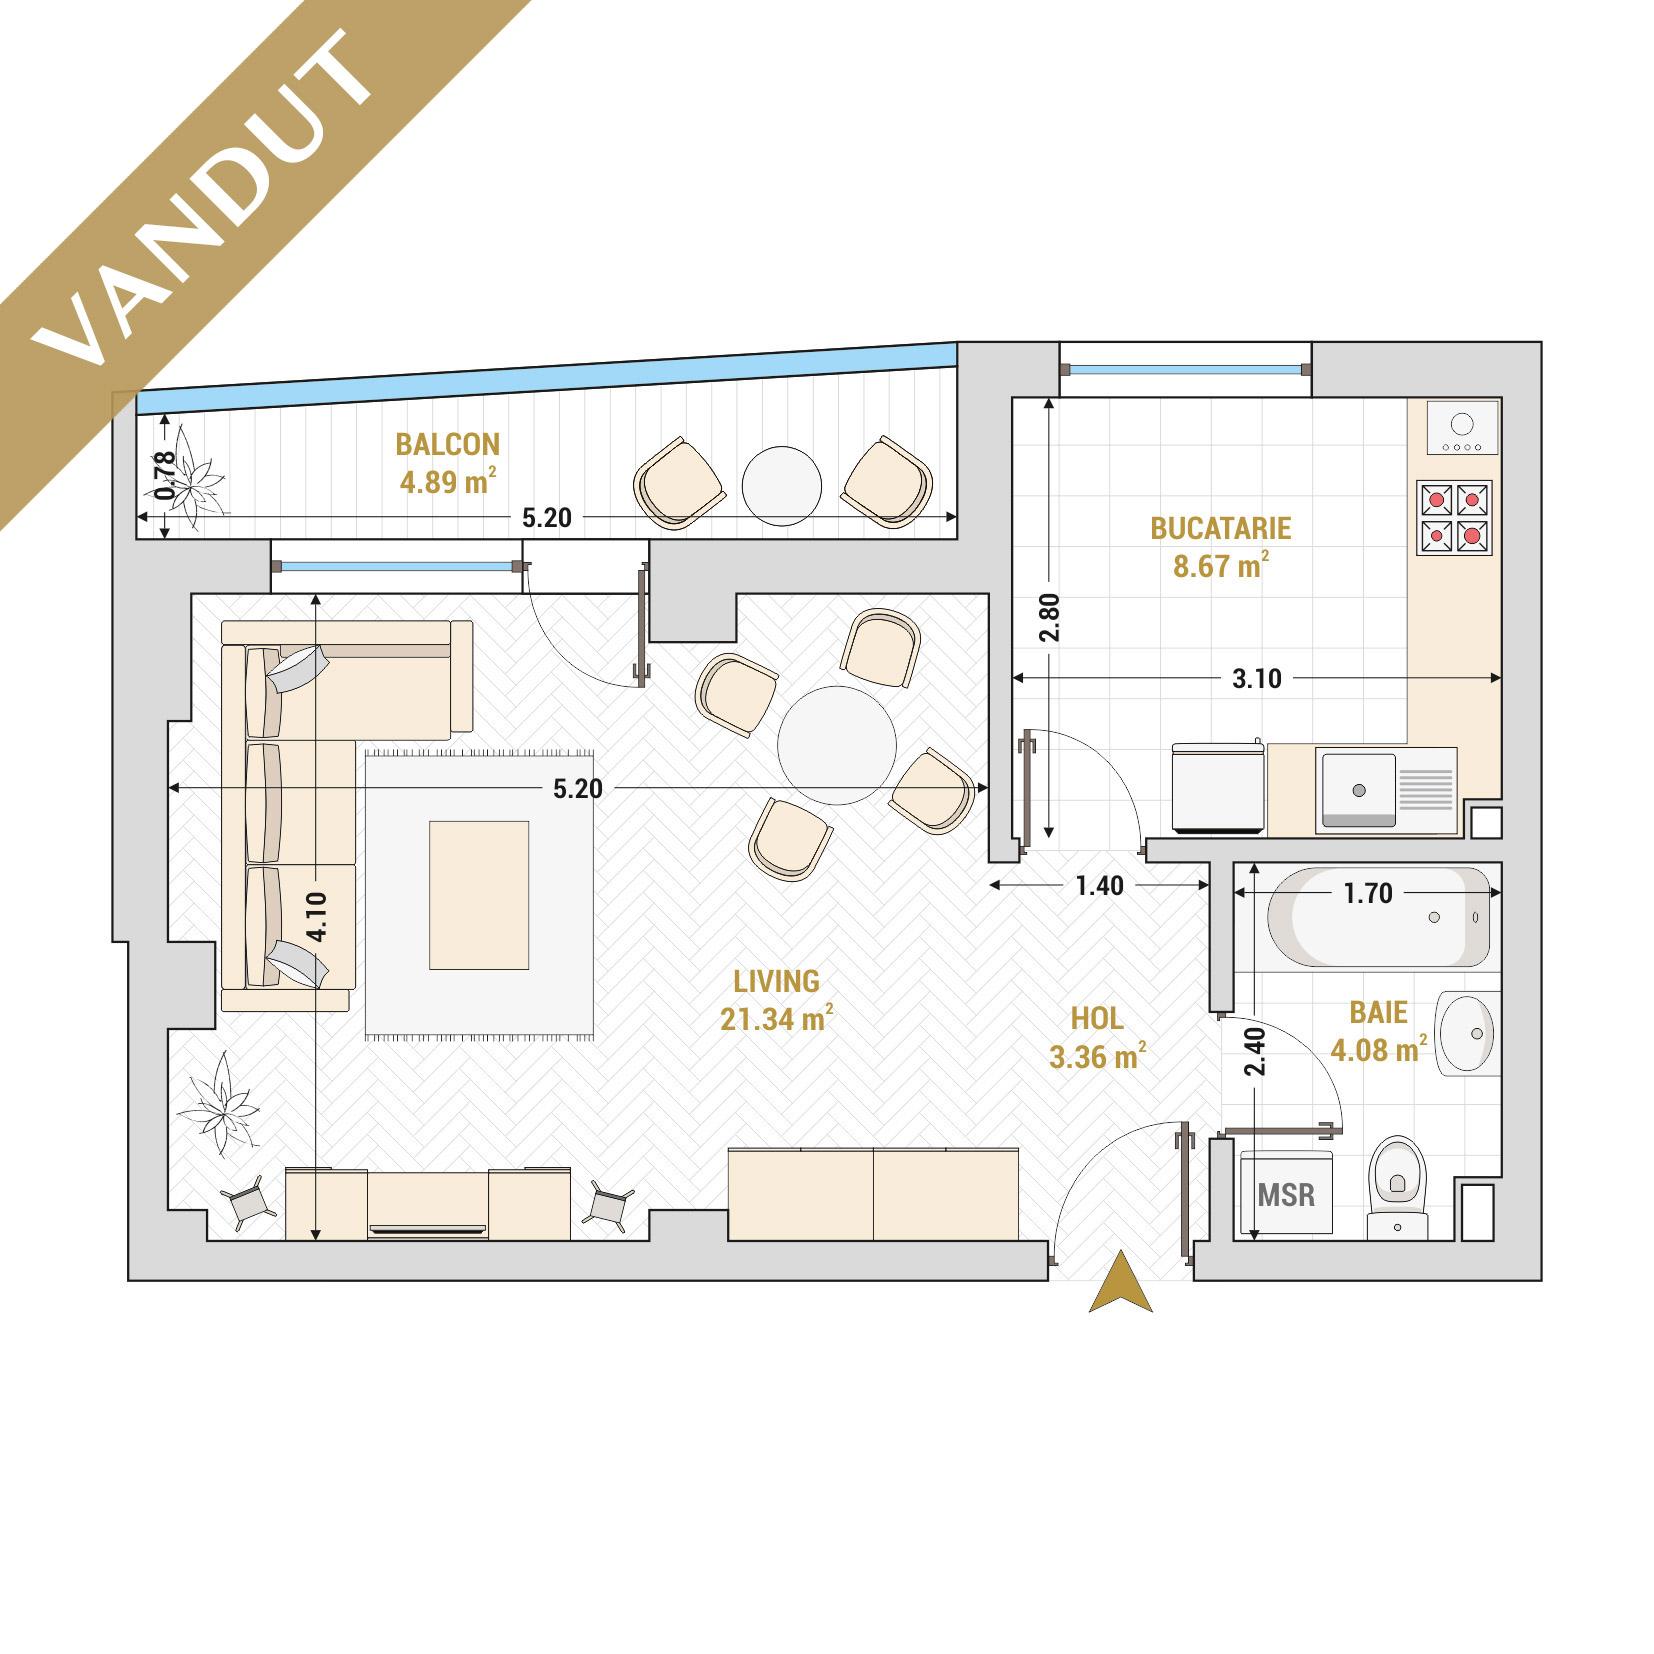 Garsoniere de vanzare Bucuresti - Catedral Residence - Marriott, Piata Unirii, 13 Septembrie, Izvor - Tip 3 - T1 - V